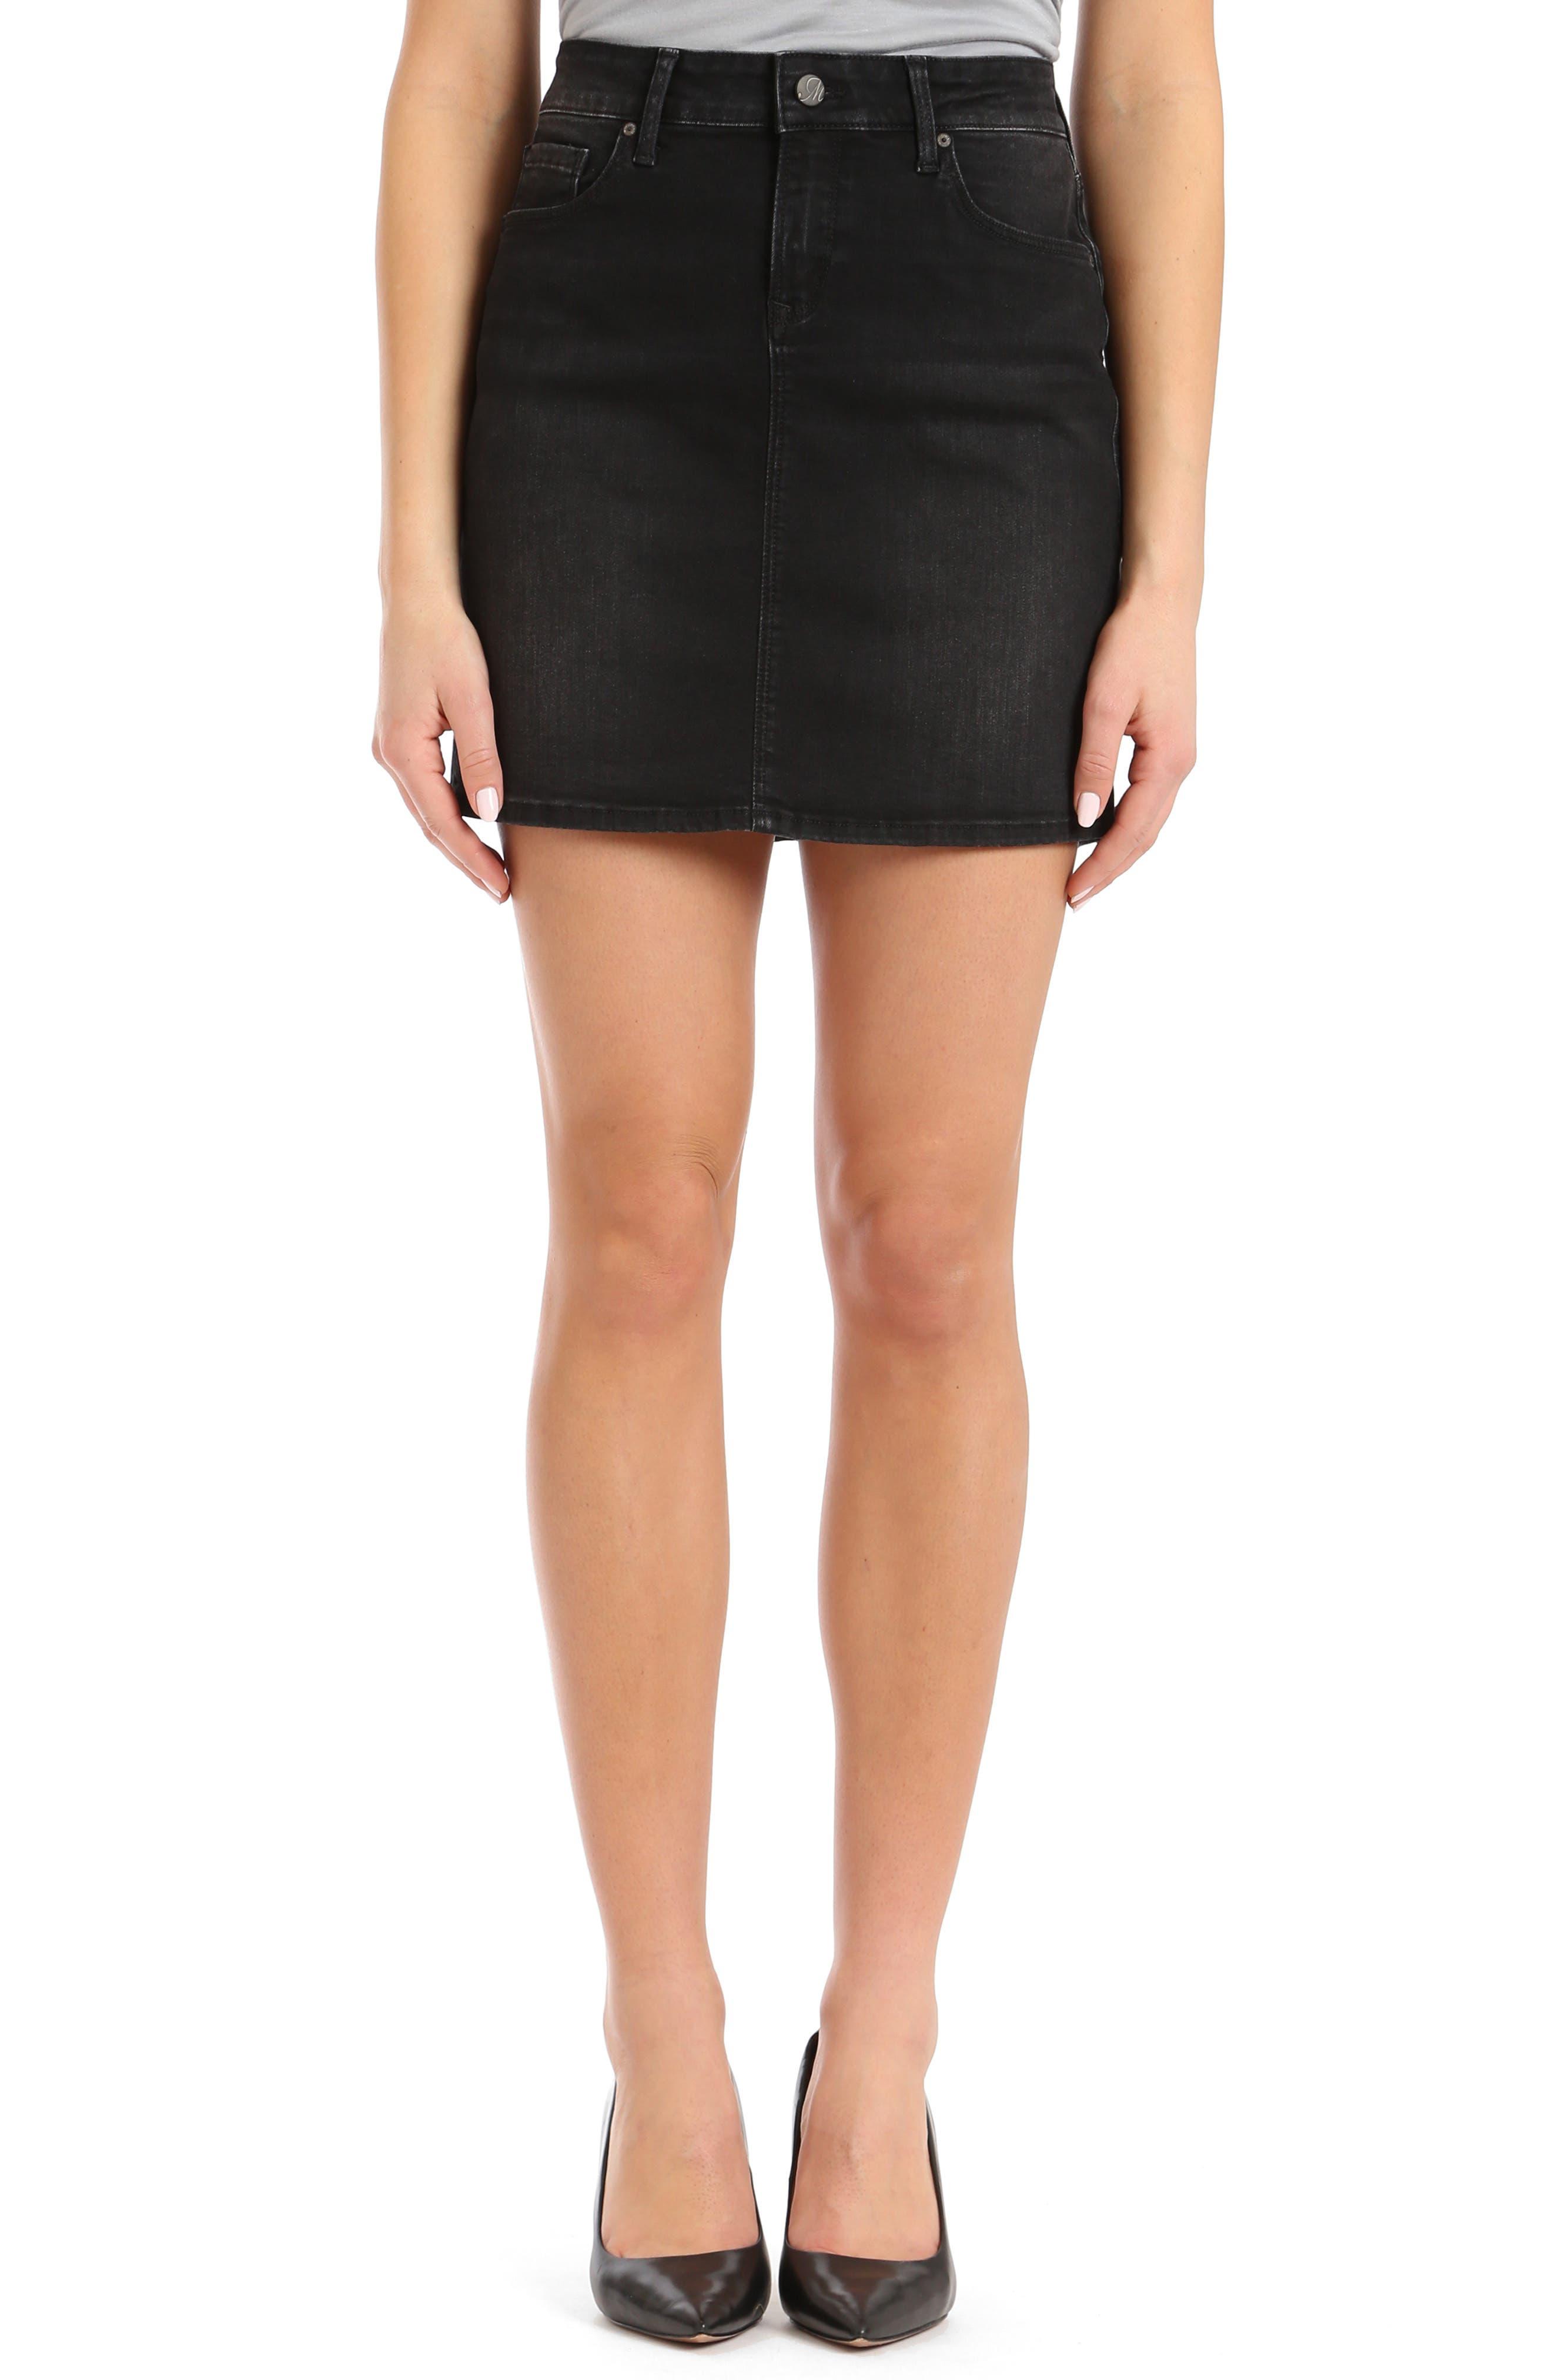 Mavi Jeans Rita Denim Miniskirt, Black